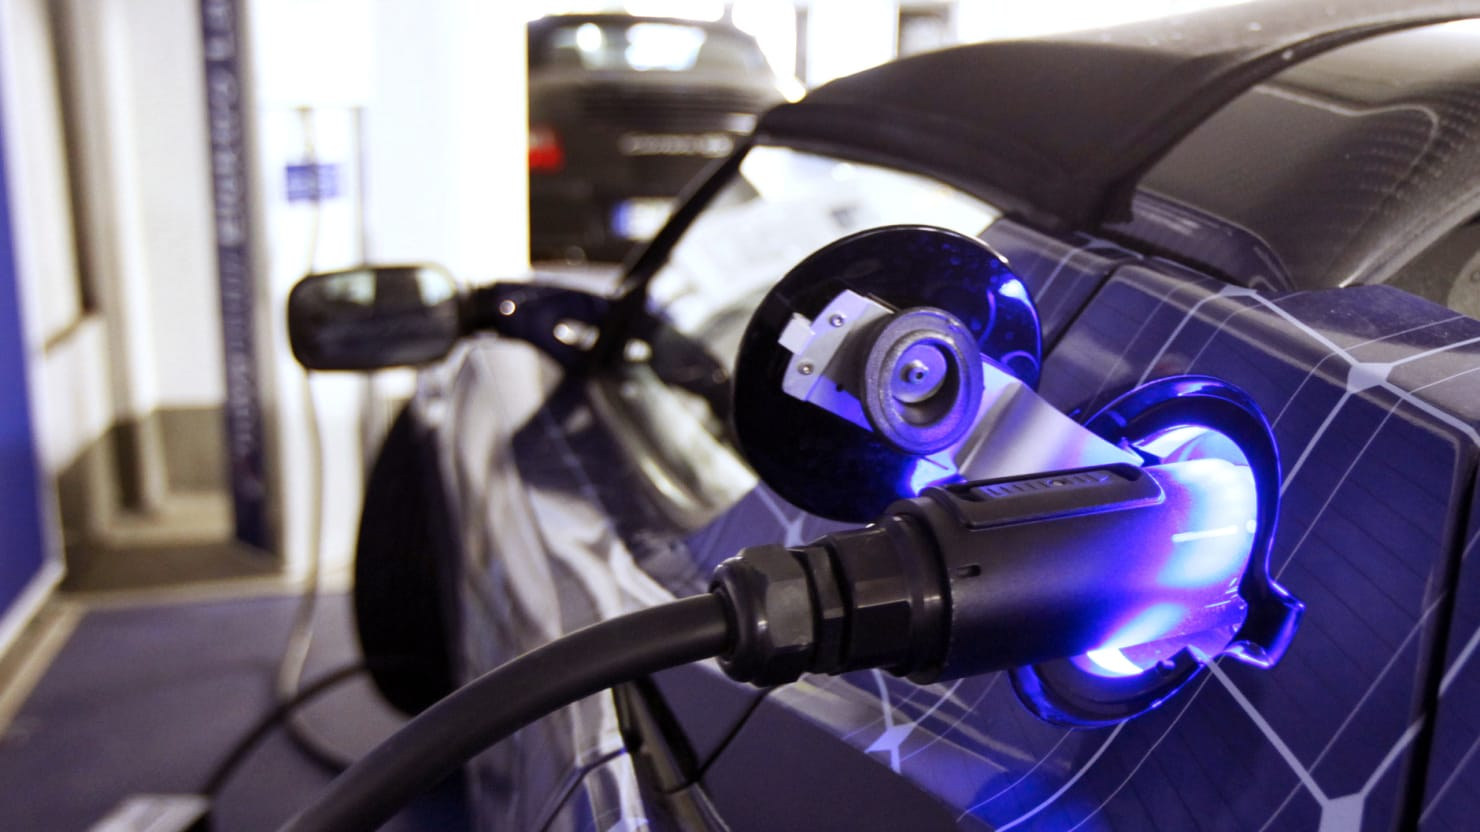 Tesla Motors CEO Elon Musk Unveils New Battery Swap System for Model S